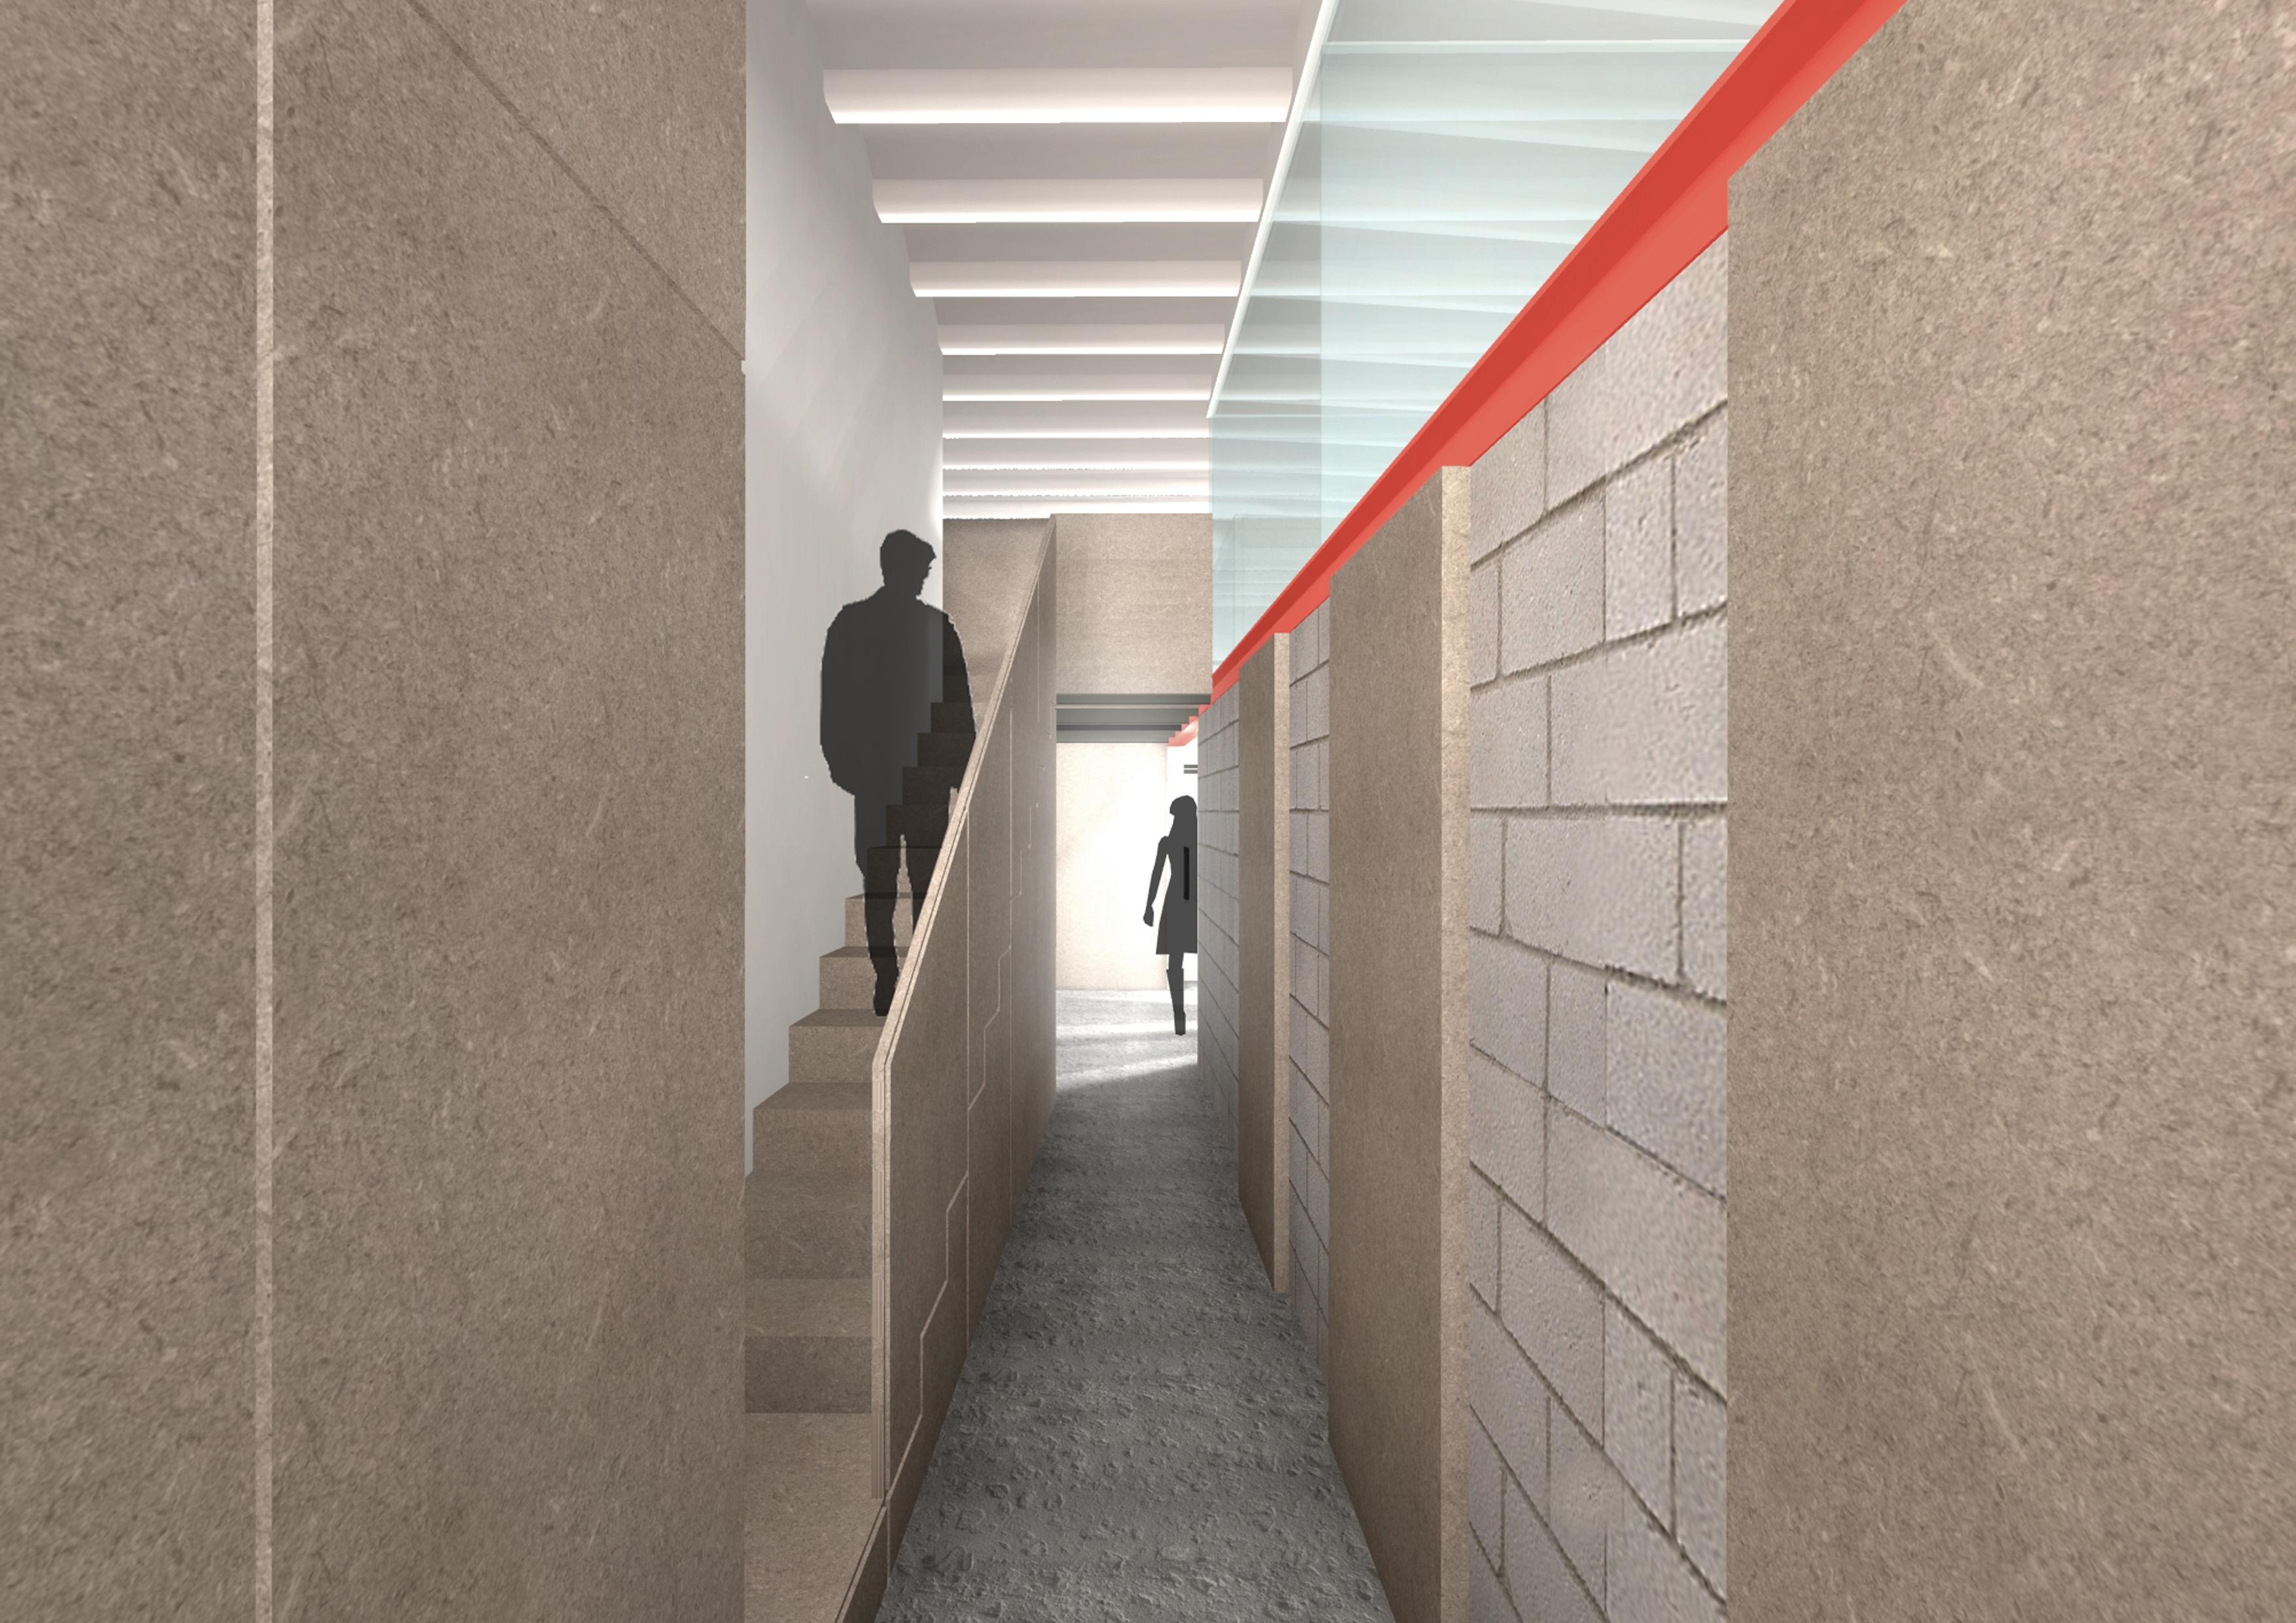 Sala Ferusic Architects Cabestany Carles Sala Relja Ferusic